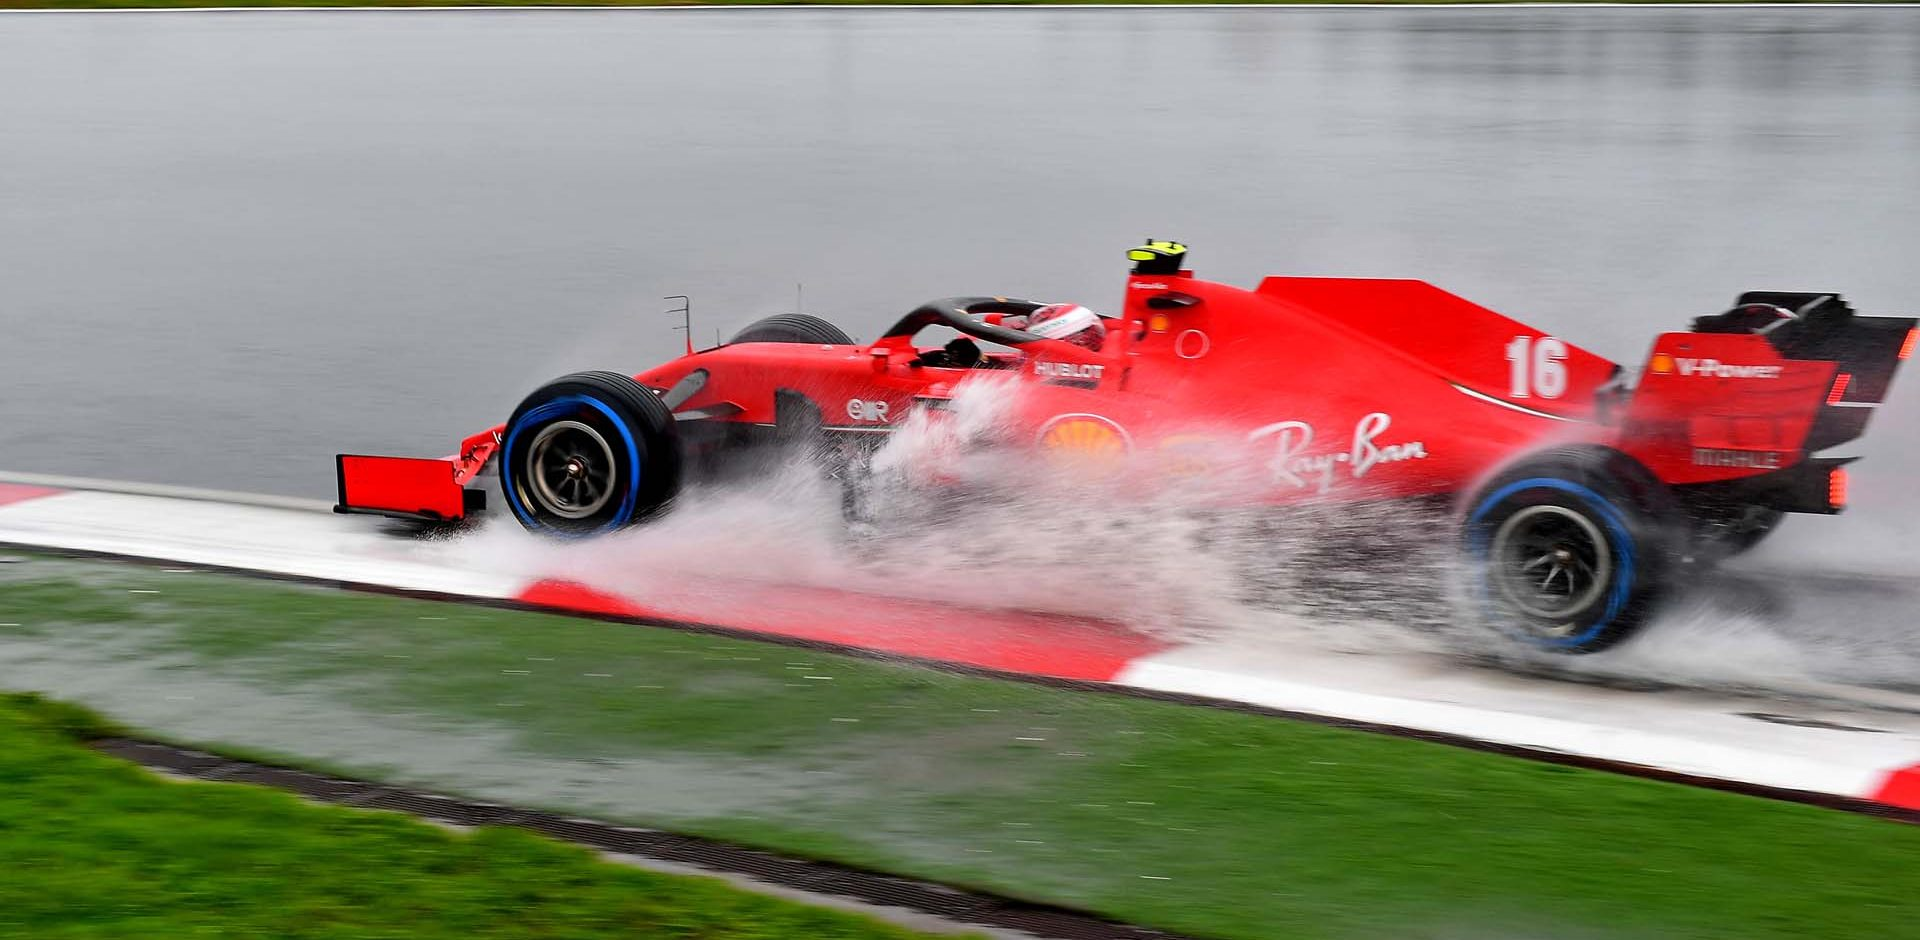 GP TURCHIA  F1/2020 -  SABATO 14/11/2020    credit: @Scuderia Ferrari Press Office Charles Leclerc wet, rain, beauty